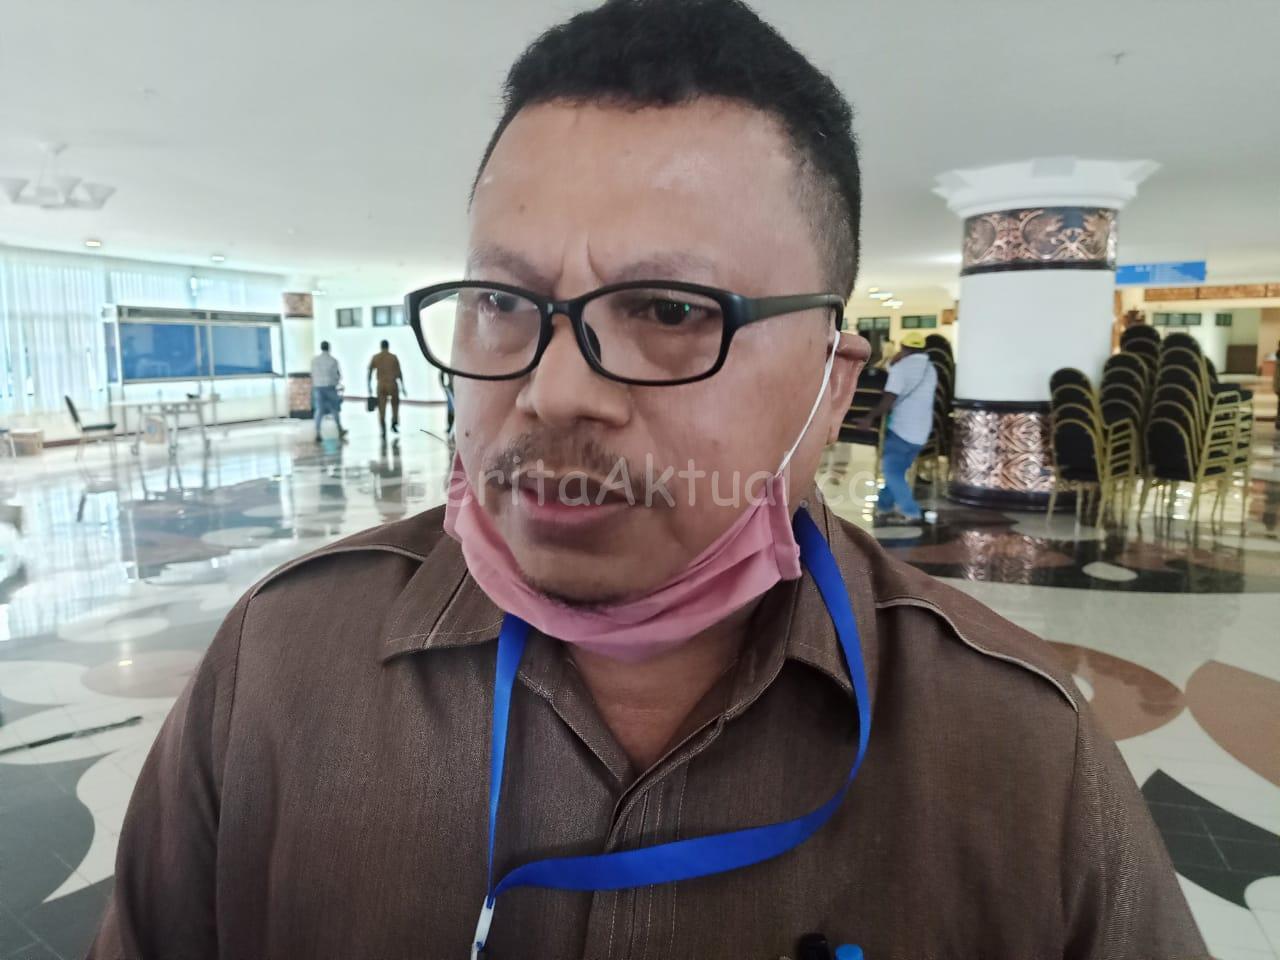 Hampir Sebulan Belum Ada Yang Klaim Sebagai Pencipta Lagu Tanah Papua 1 IMG 20200610 WA0023